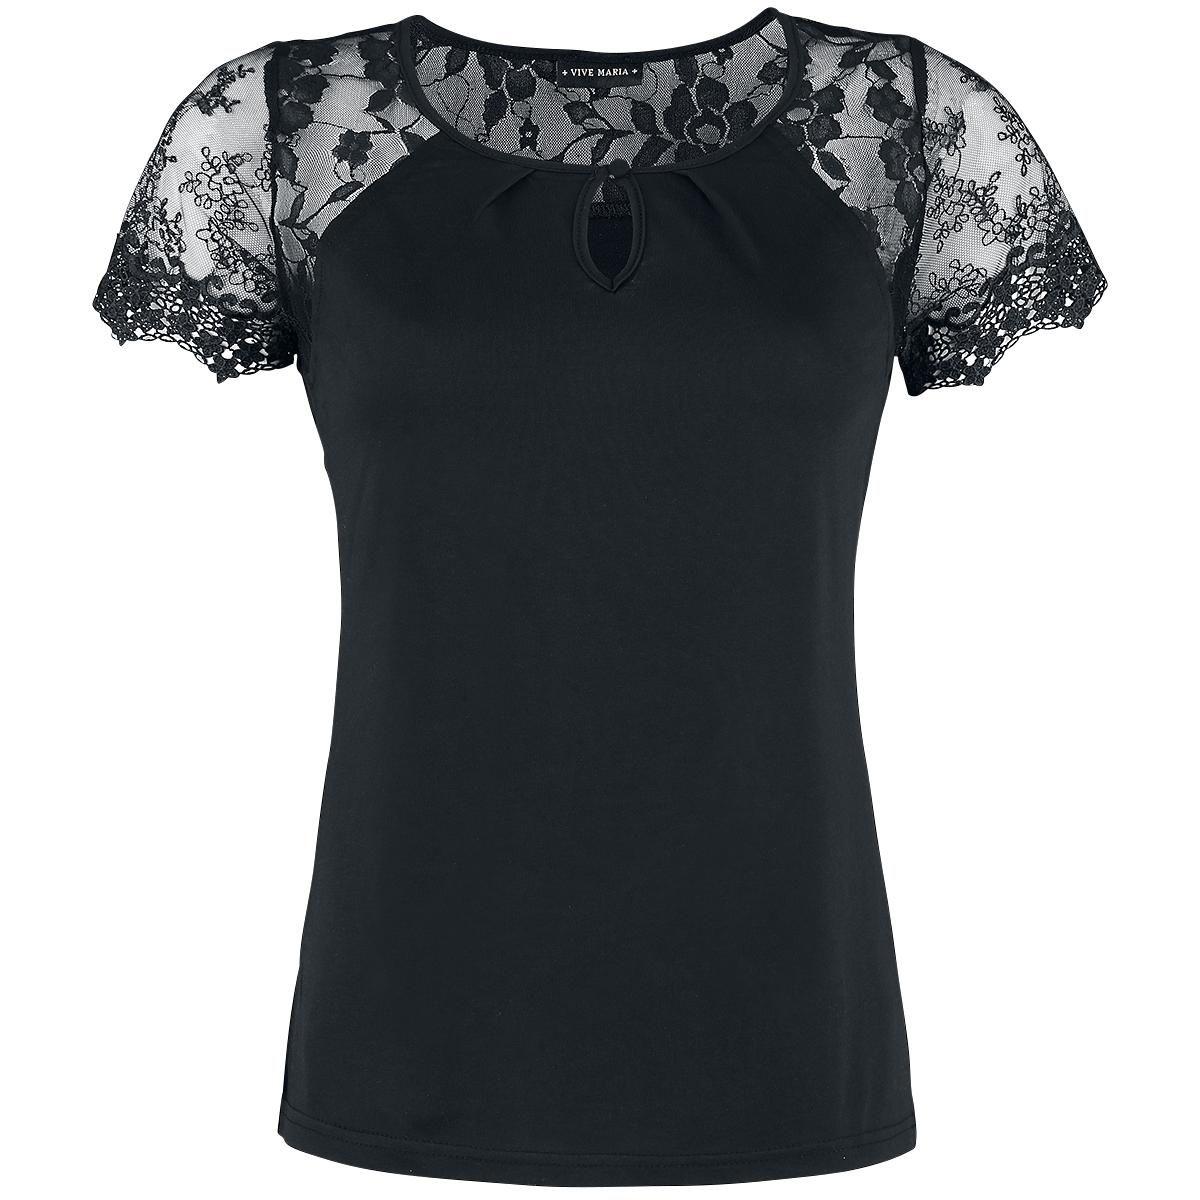 Black London Shirt - T-shirt van Vive Maria